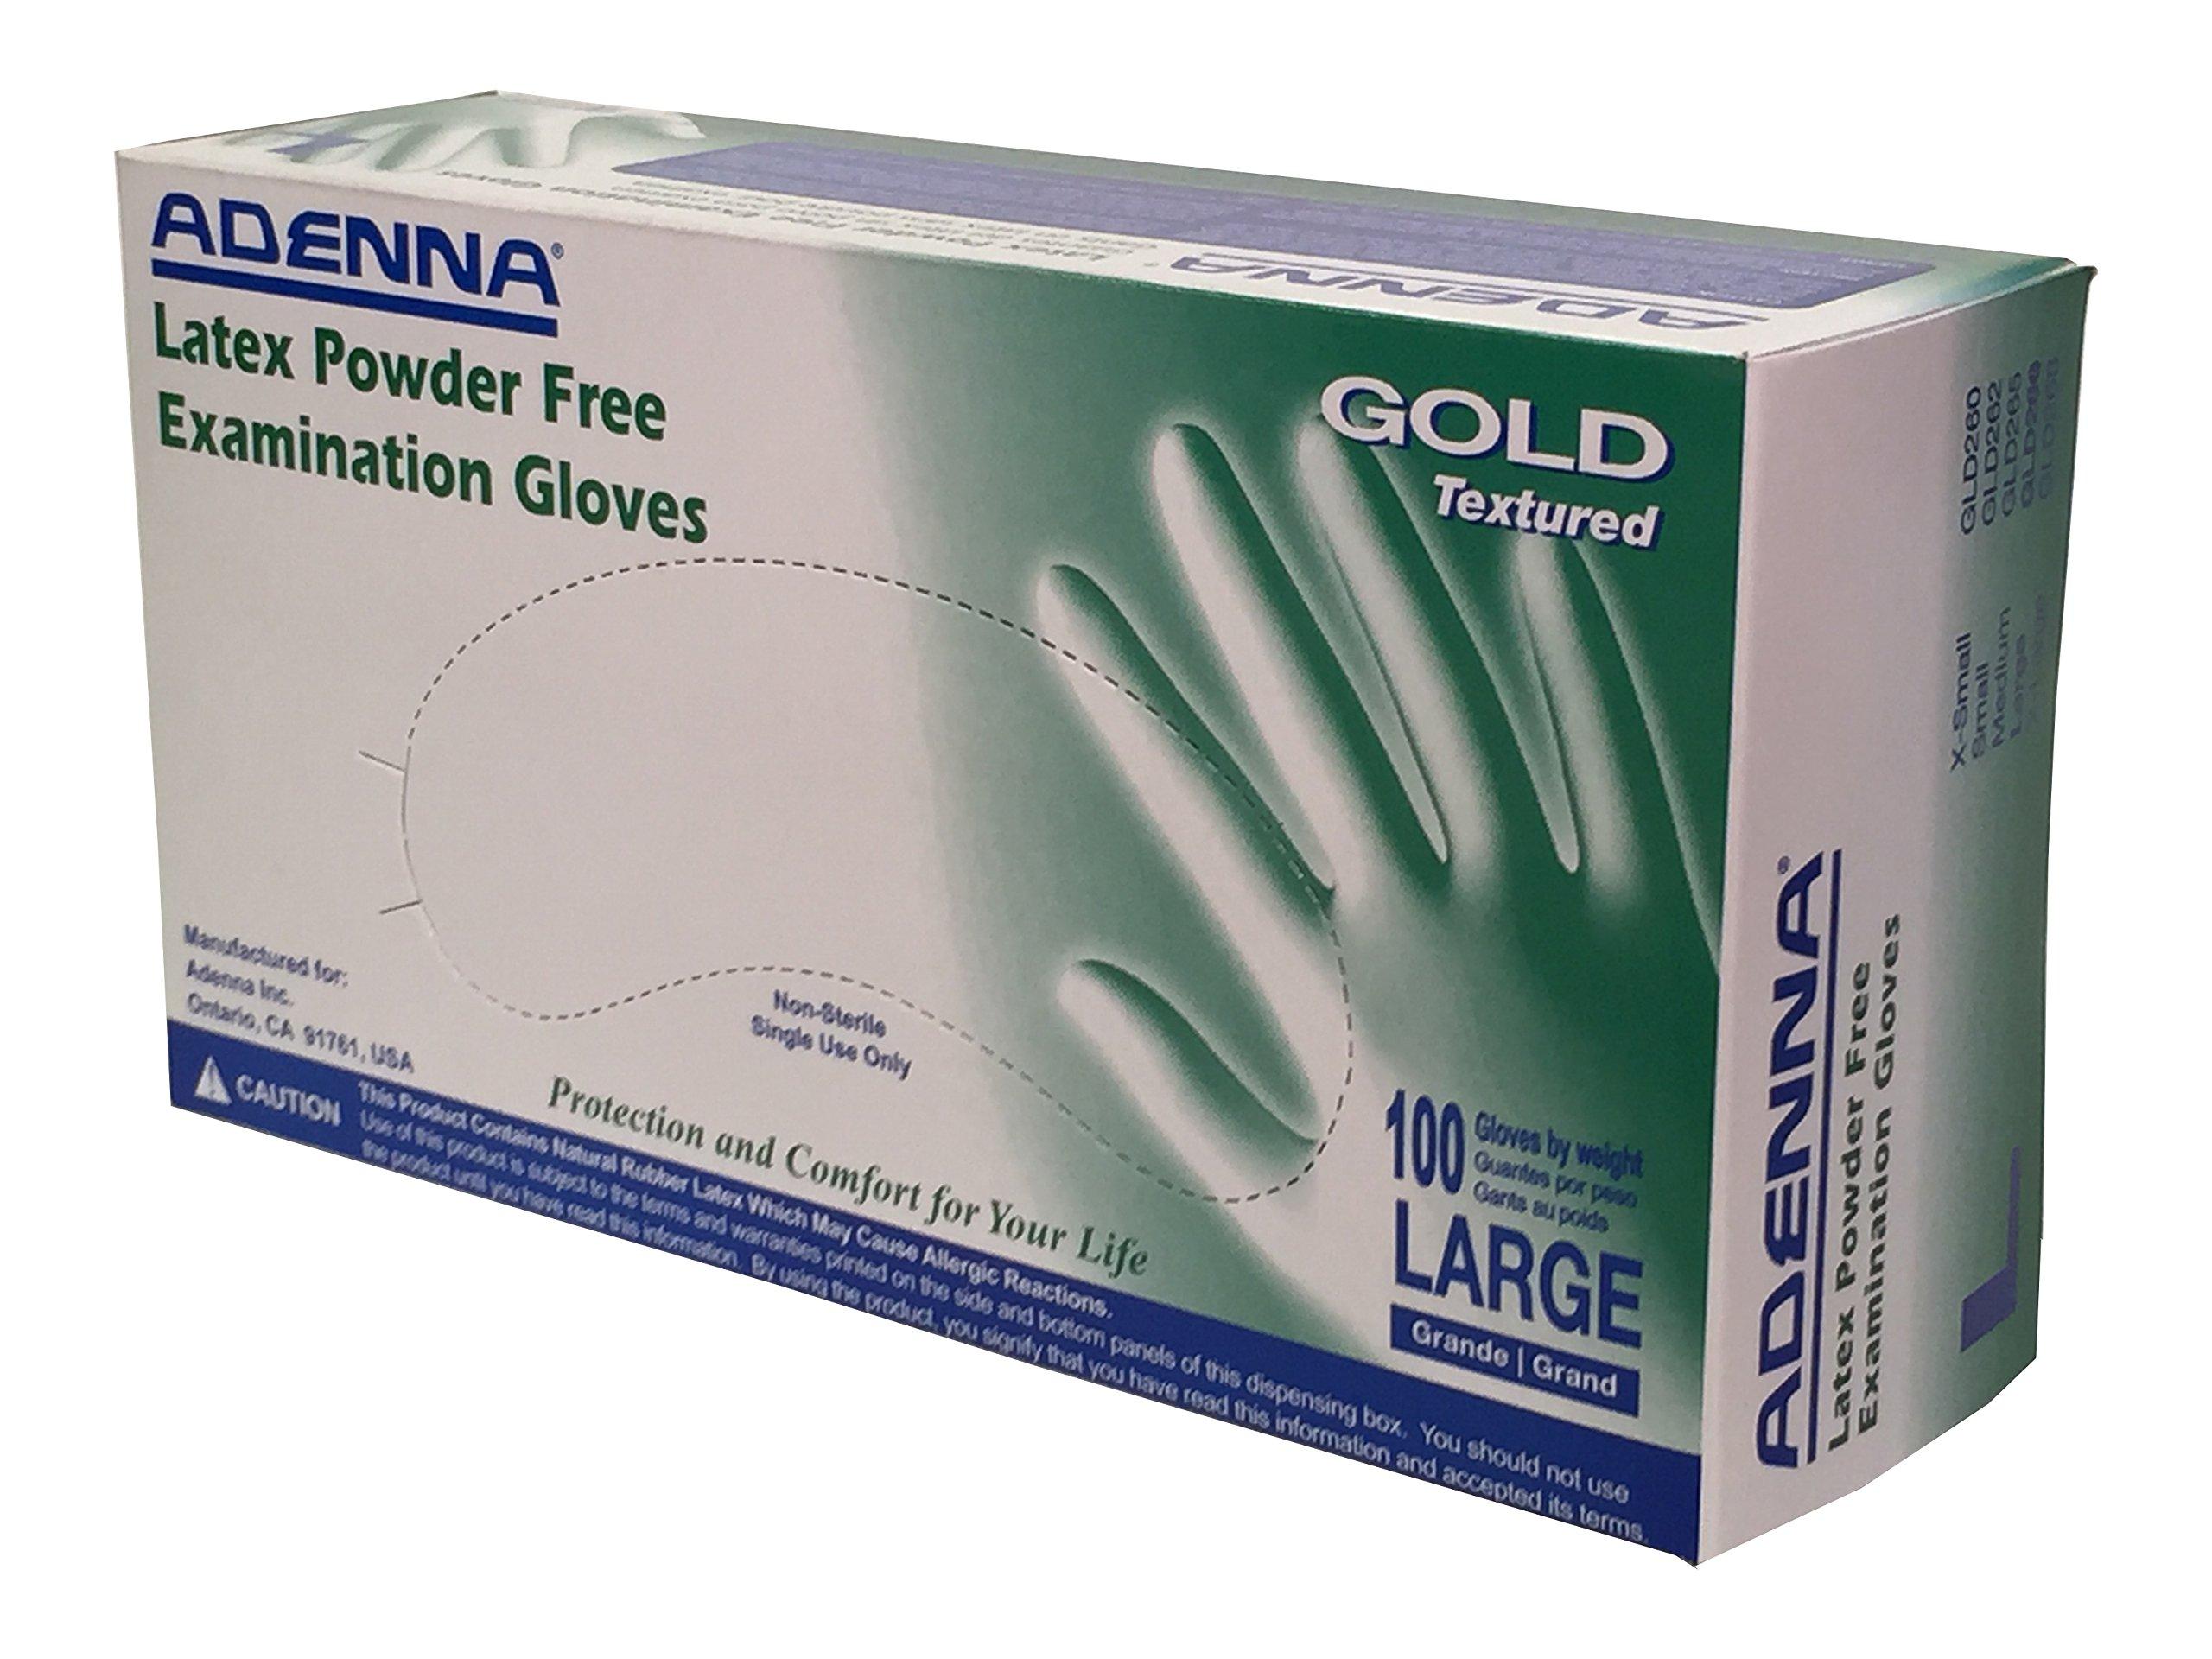 Adenna Gold 6 mil Latex Powder Free Exam Gloves (White, Large) Box of 100